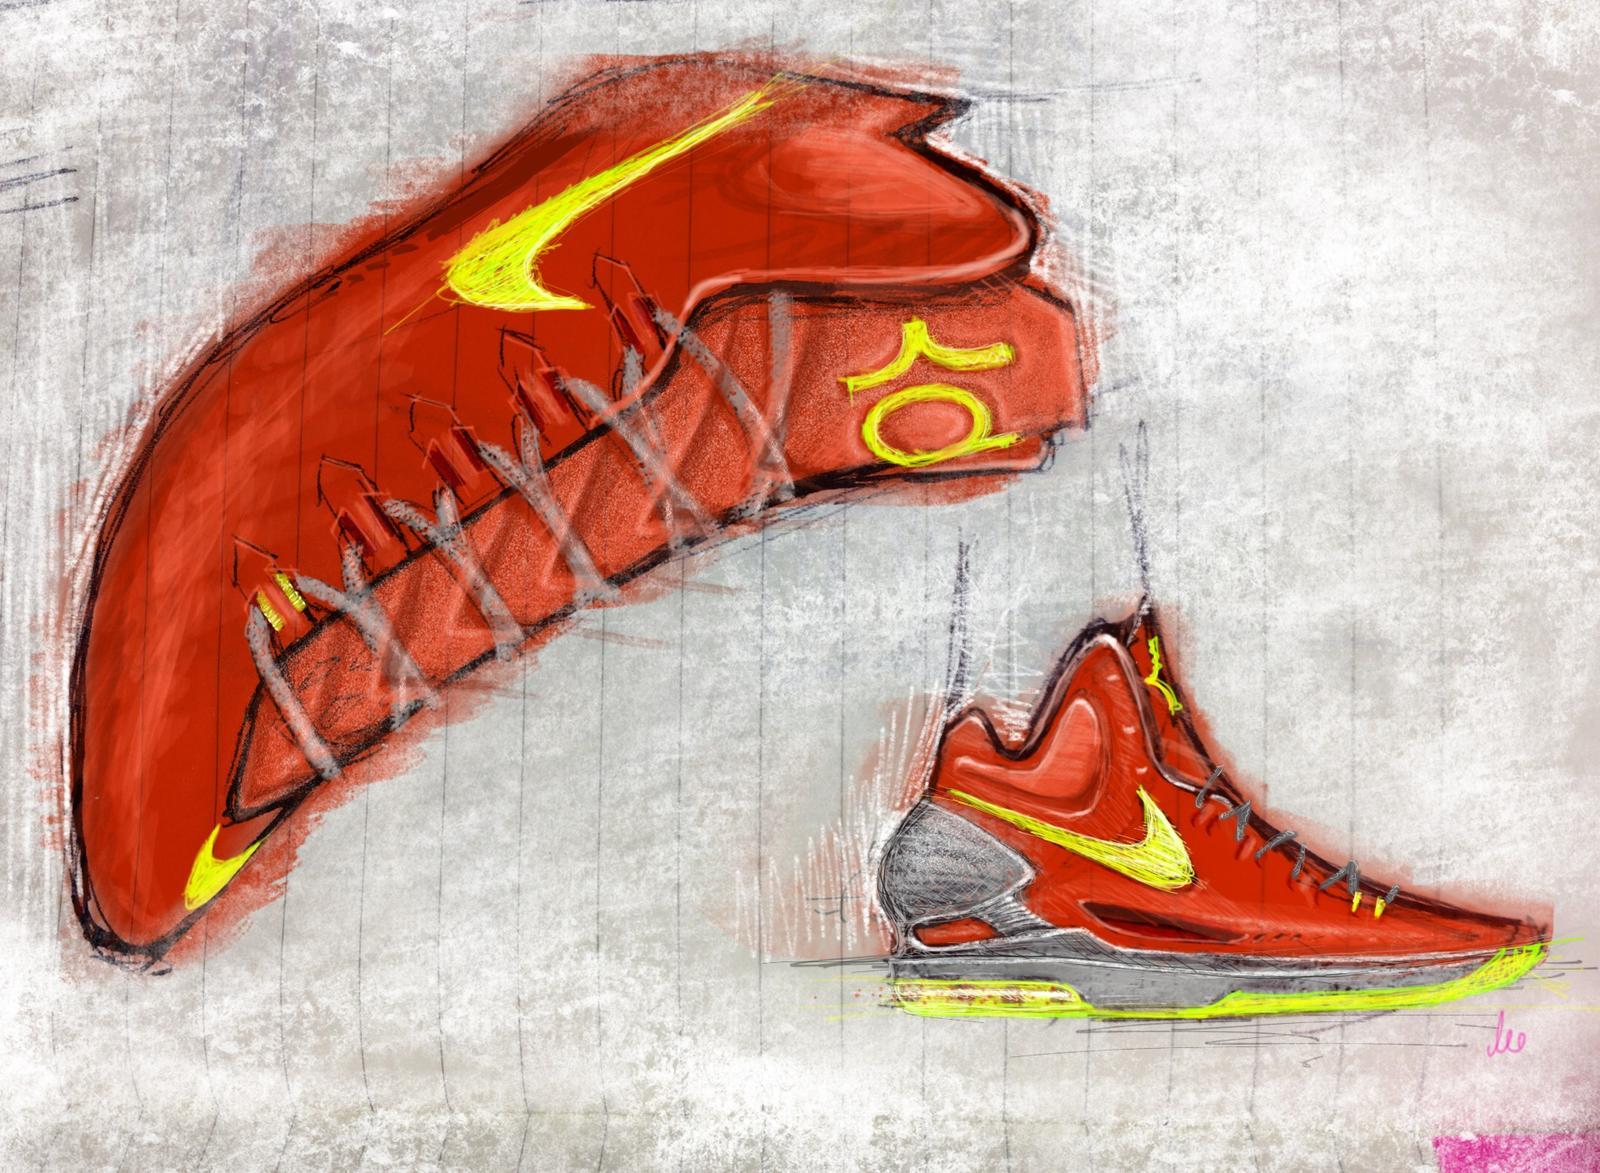 Drawn shoe kd shoe Nike KD shoe Unveiling Image